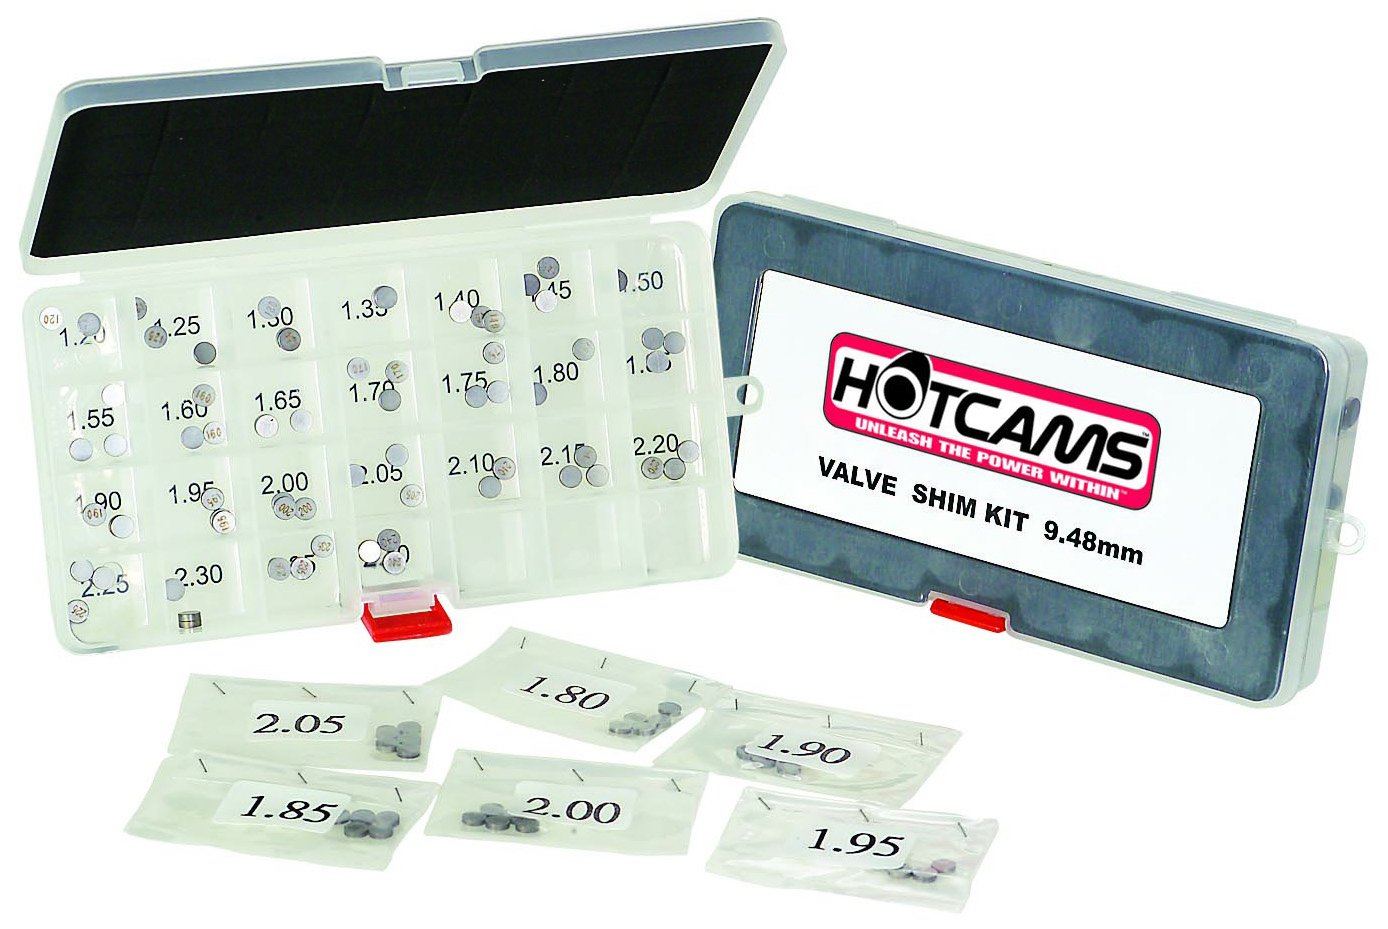 02 14 Honda Crf450r Hotcams Valve Shim Kit Silver Understanding Crf450x Alternator Wiring Diagram Automotive